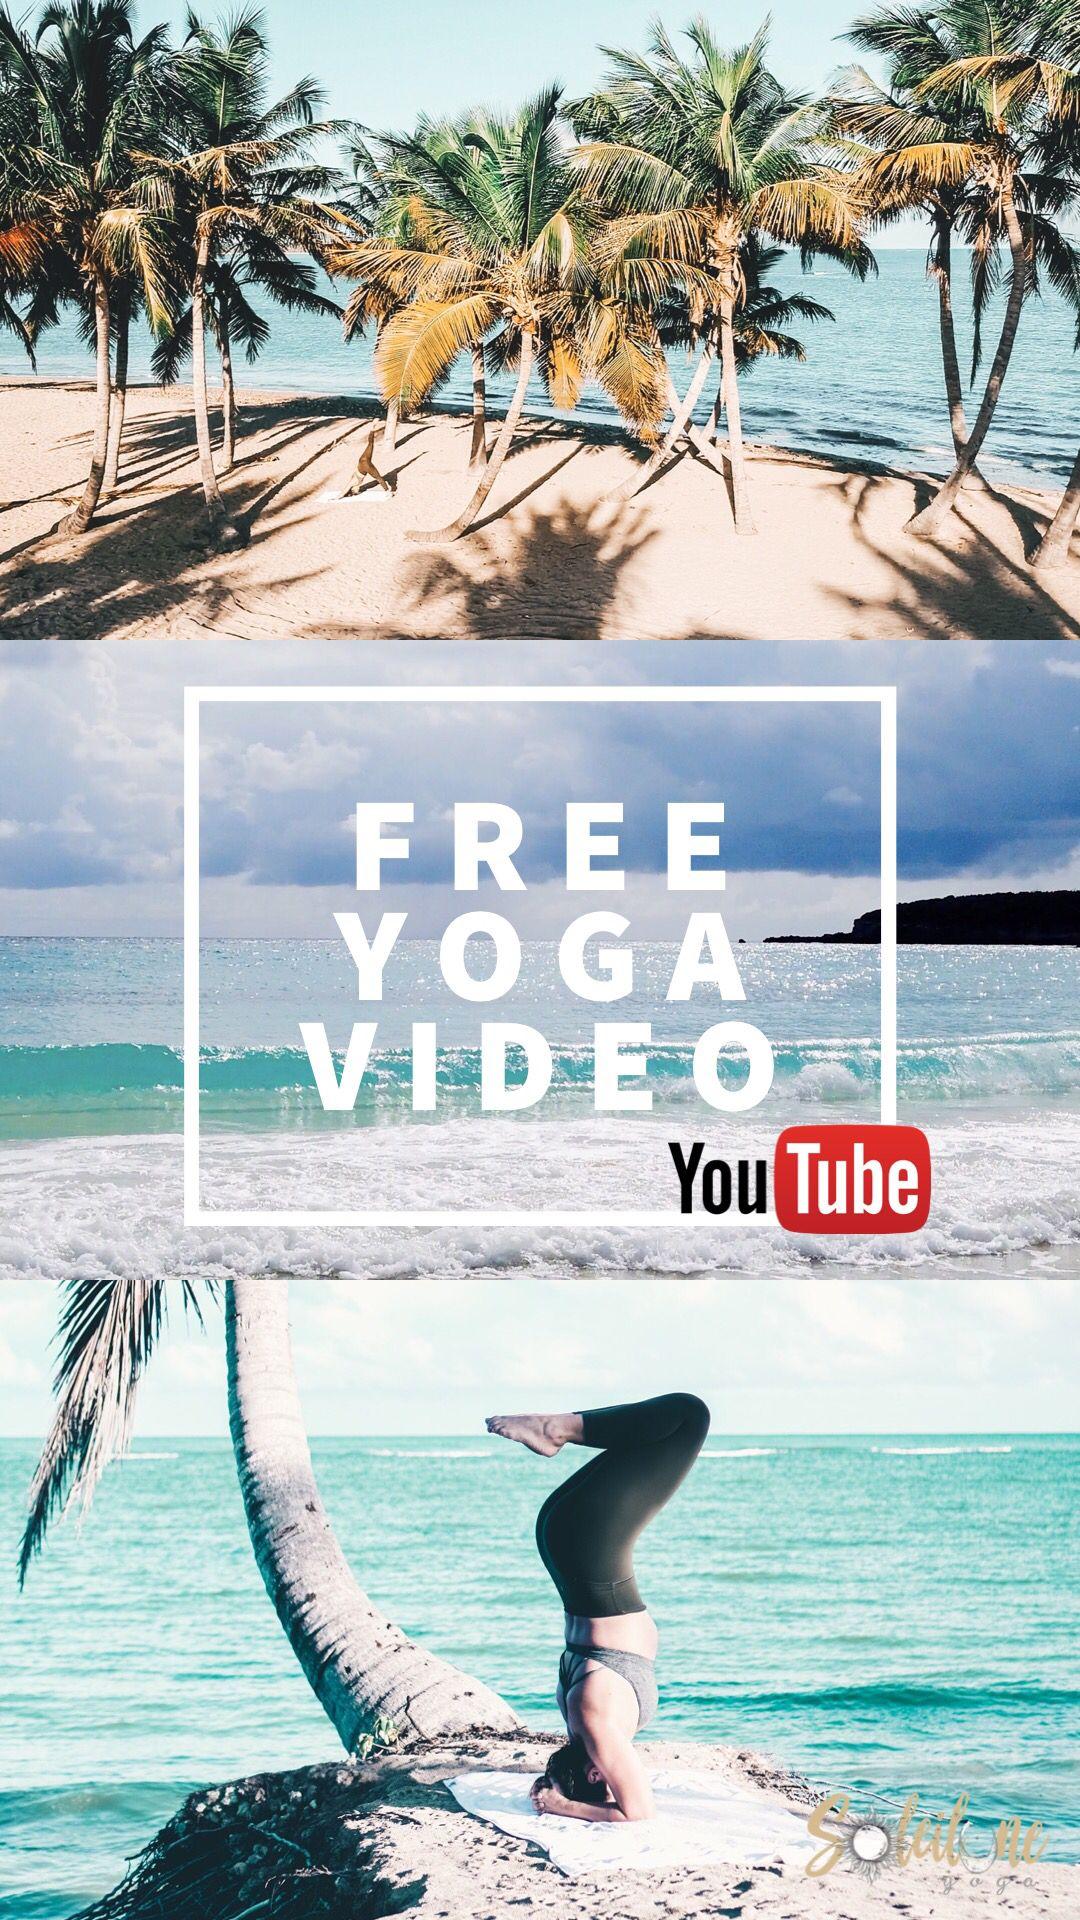 yogaforbeginners #yoga #yogavideo #freeyoga #yogayoutube